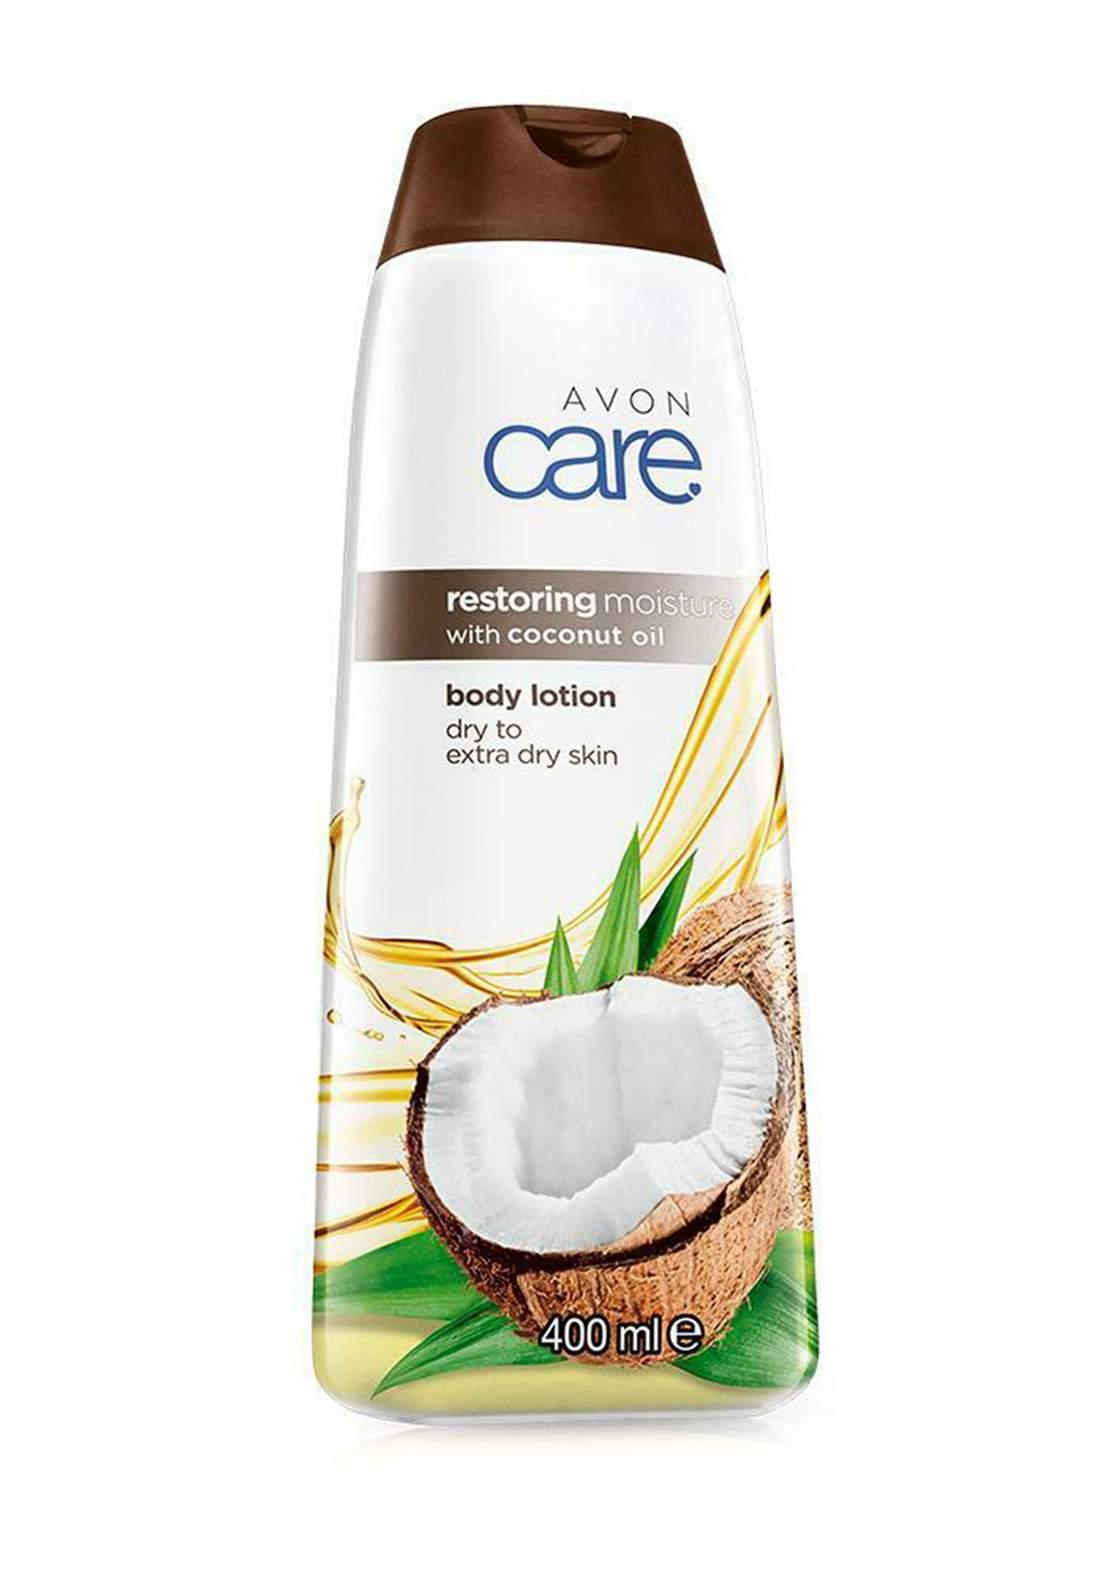 Avon 1735200 Care Restoring Moisture With Coconut Oil Body Lotion 400ml كريم ترطيب للجسم